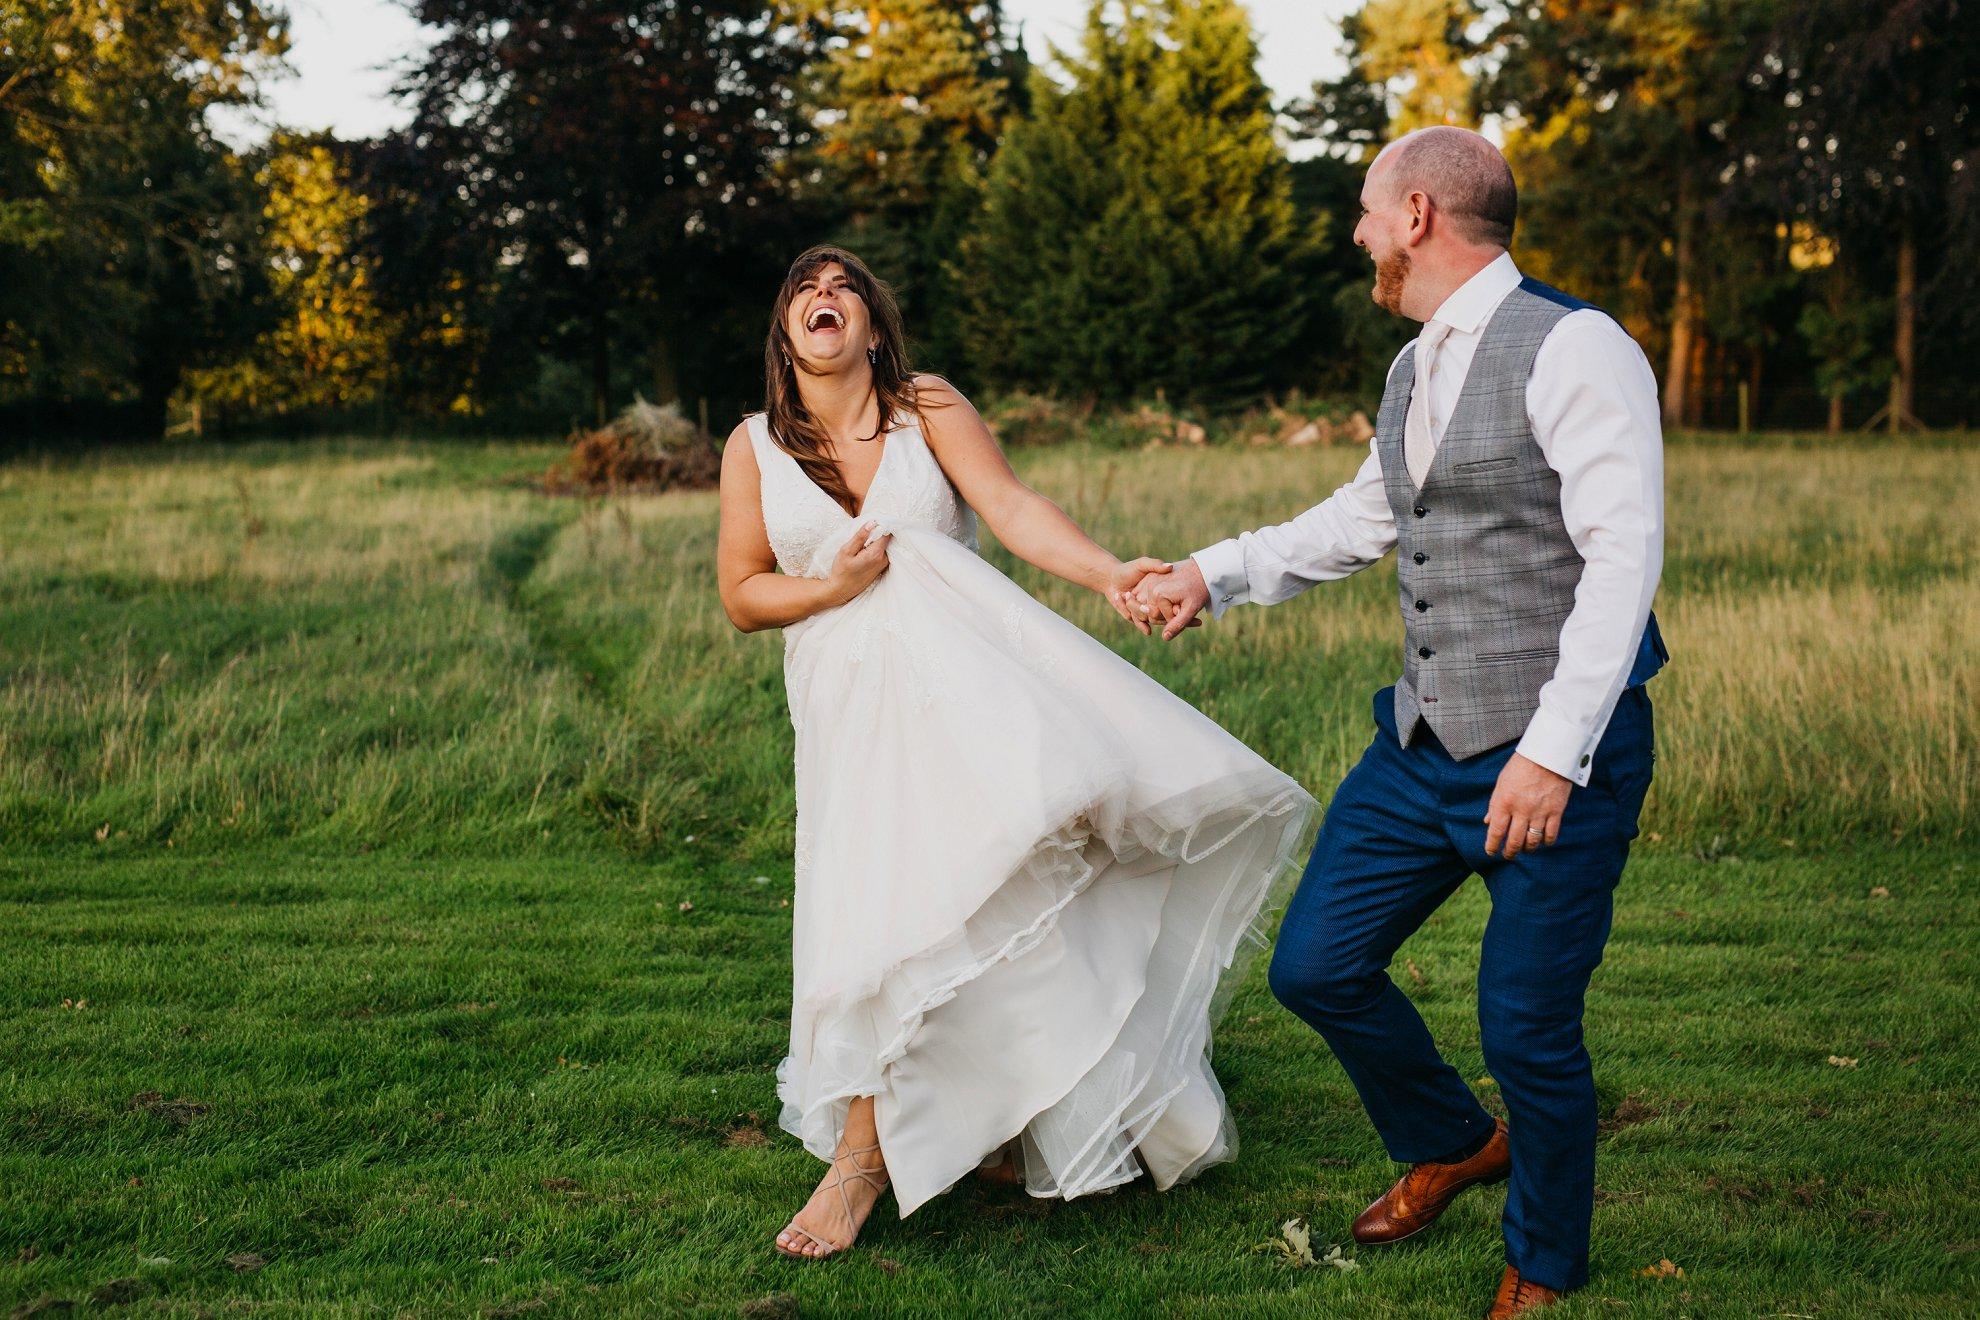 birdsgrove house weddings